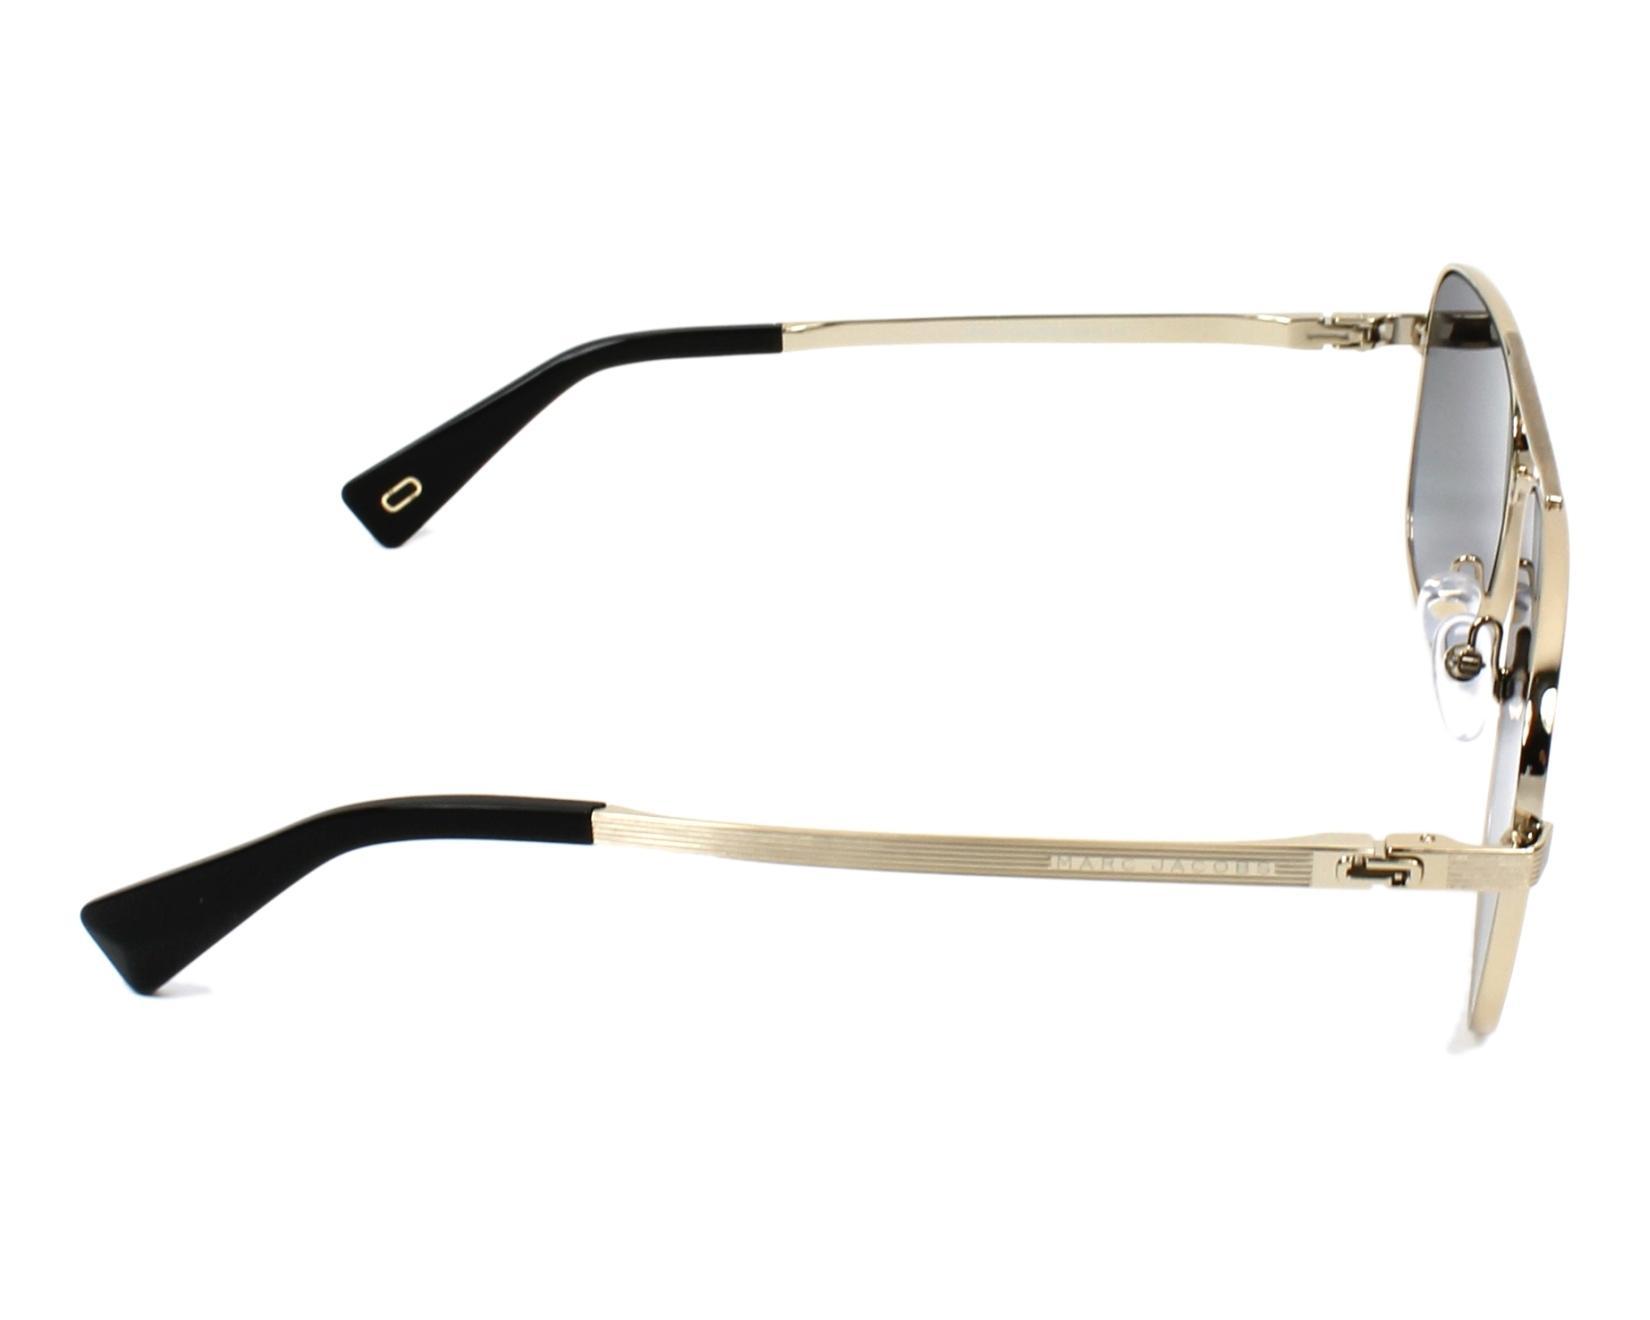 df637f0f85a Sunglasses Marc Jacobs MARC-241-S J5G FQ 59-15 Gold side